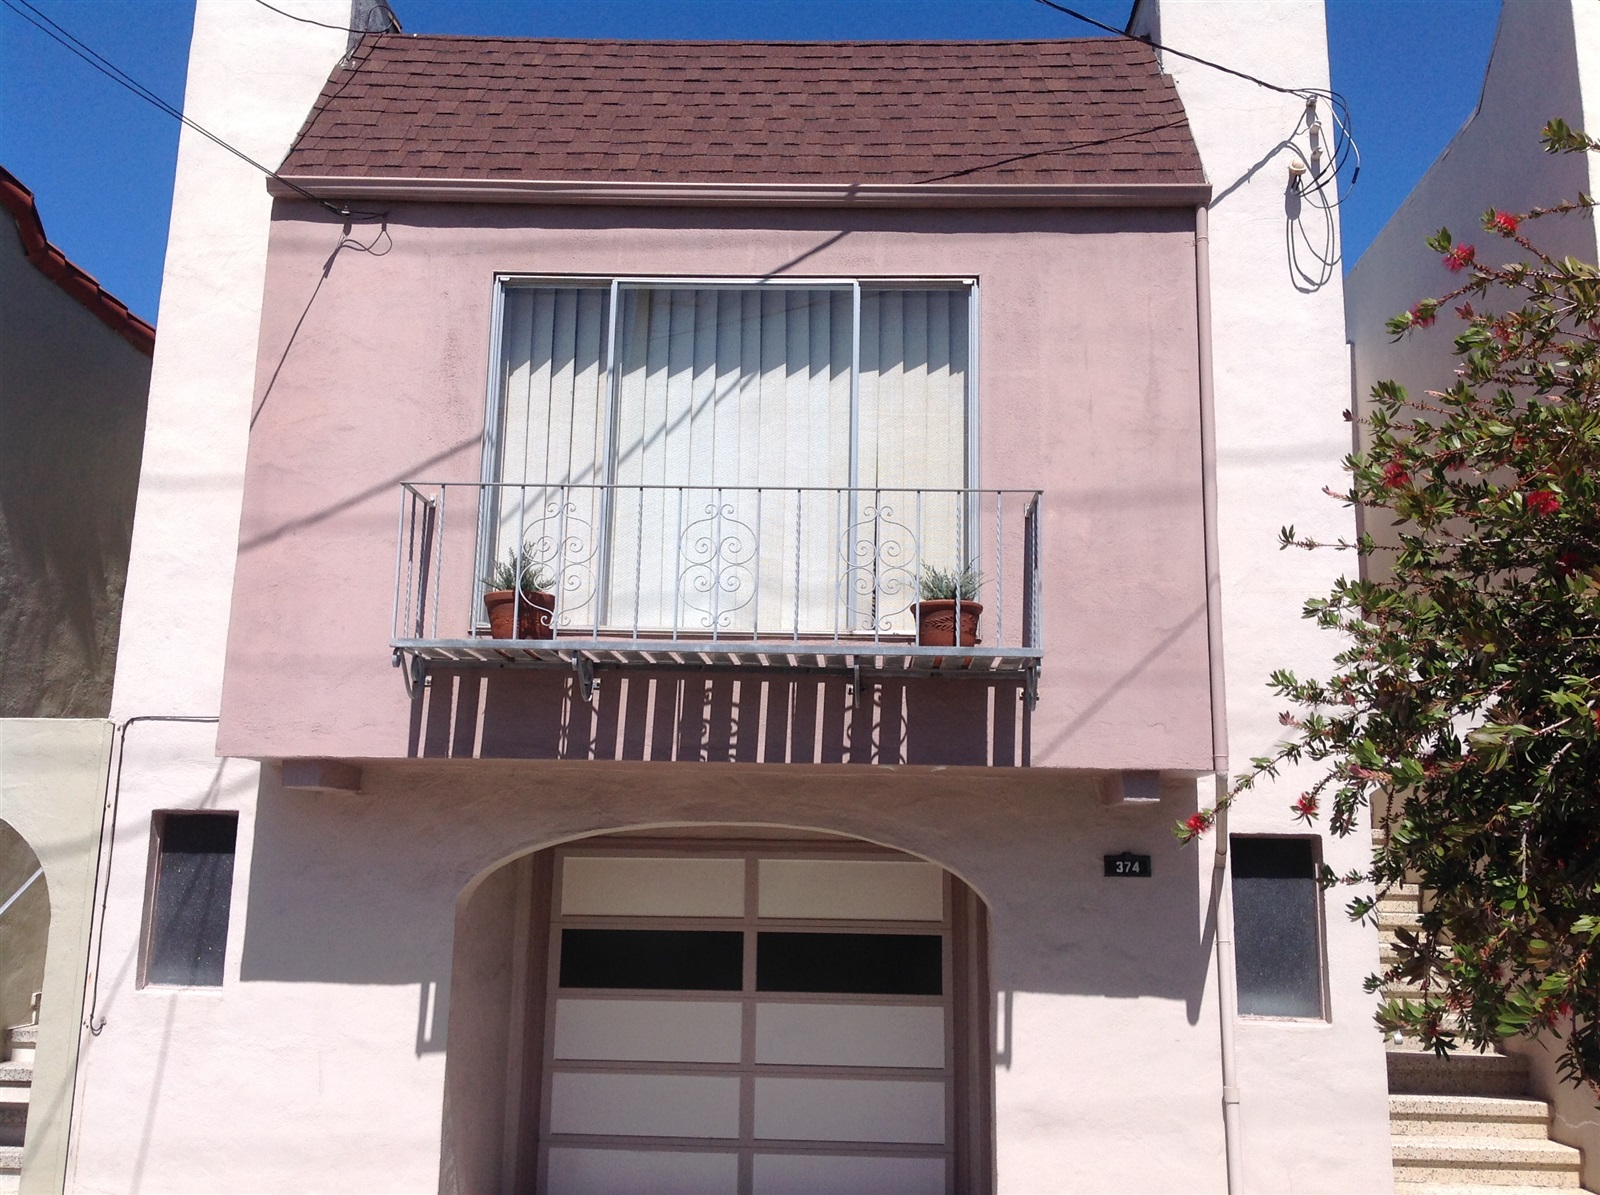 374 Athens St, San Francisco, CA 94112